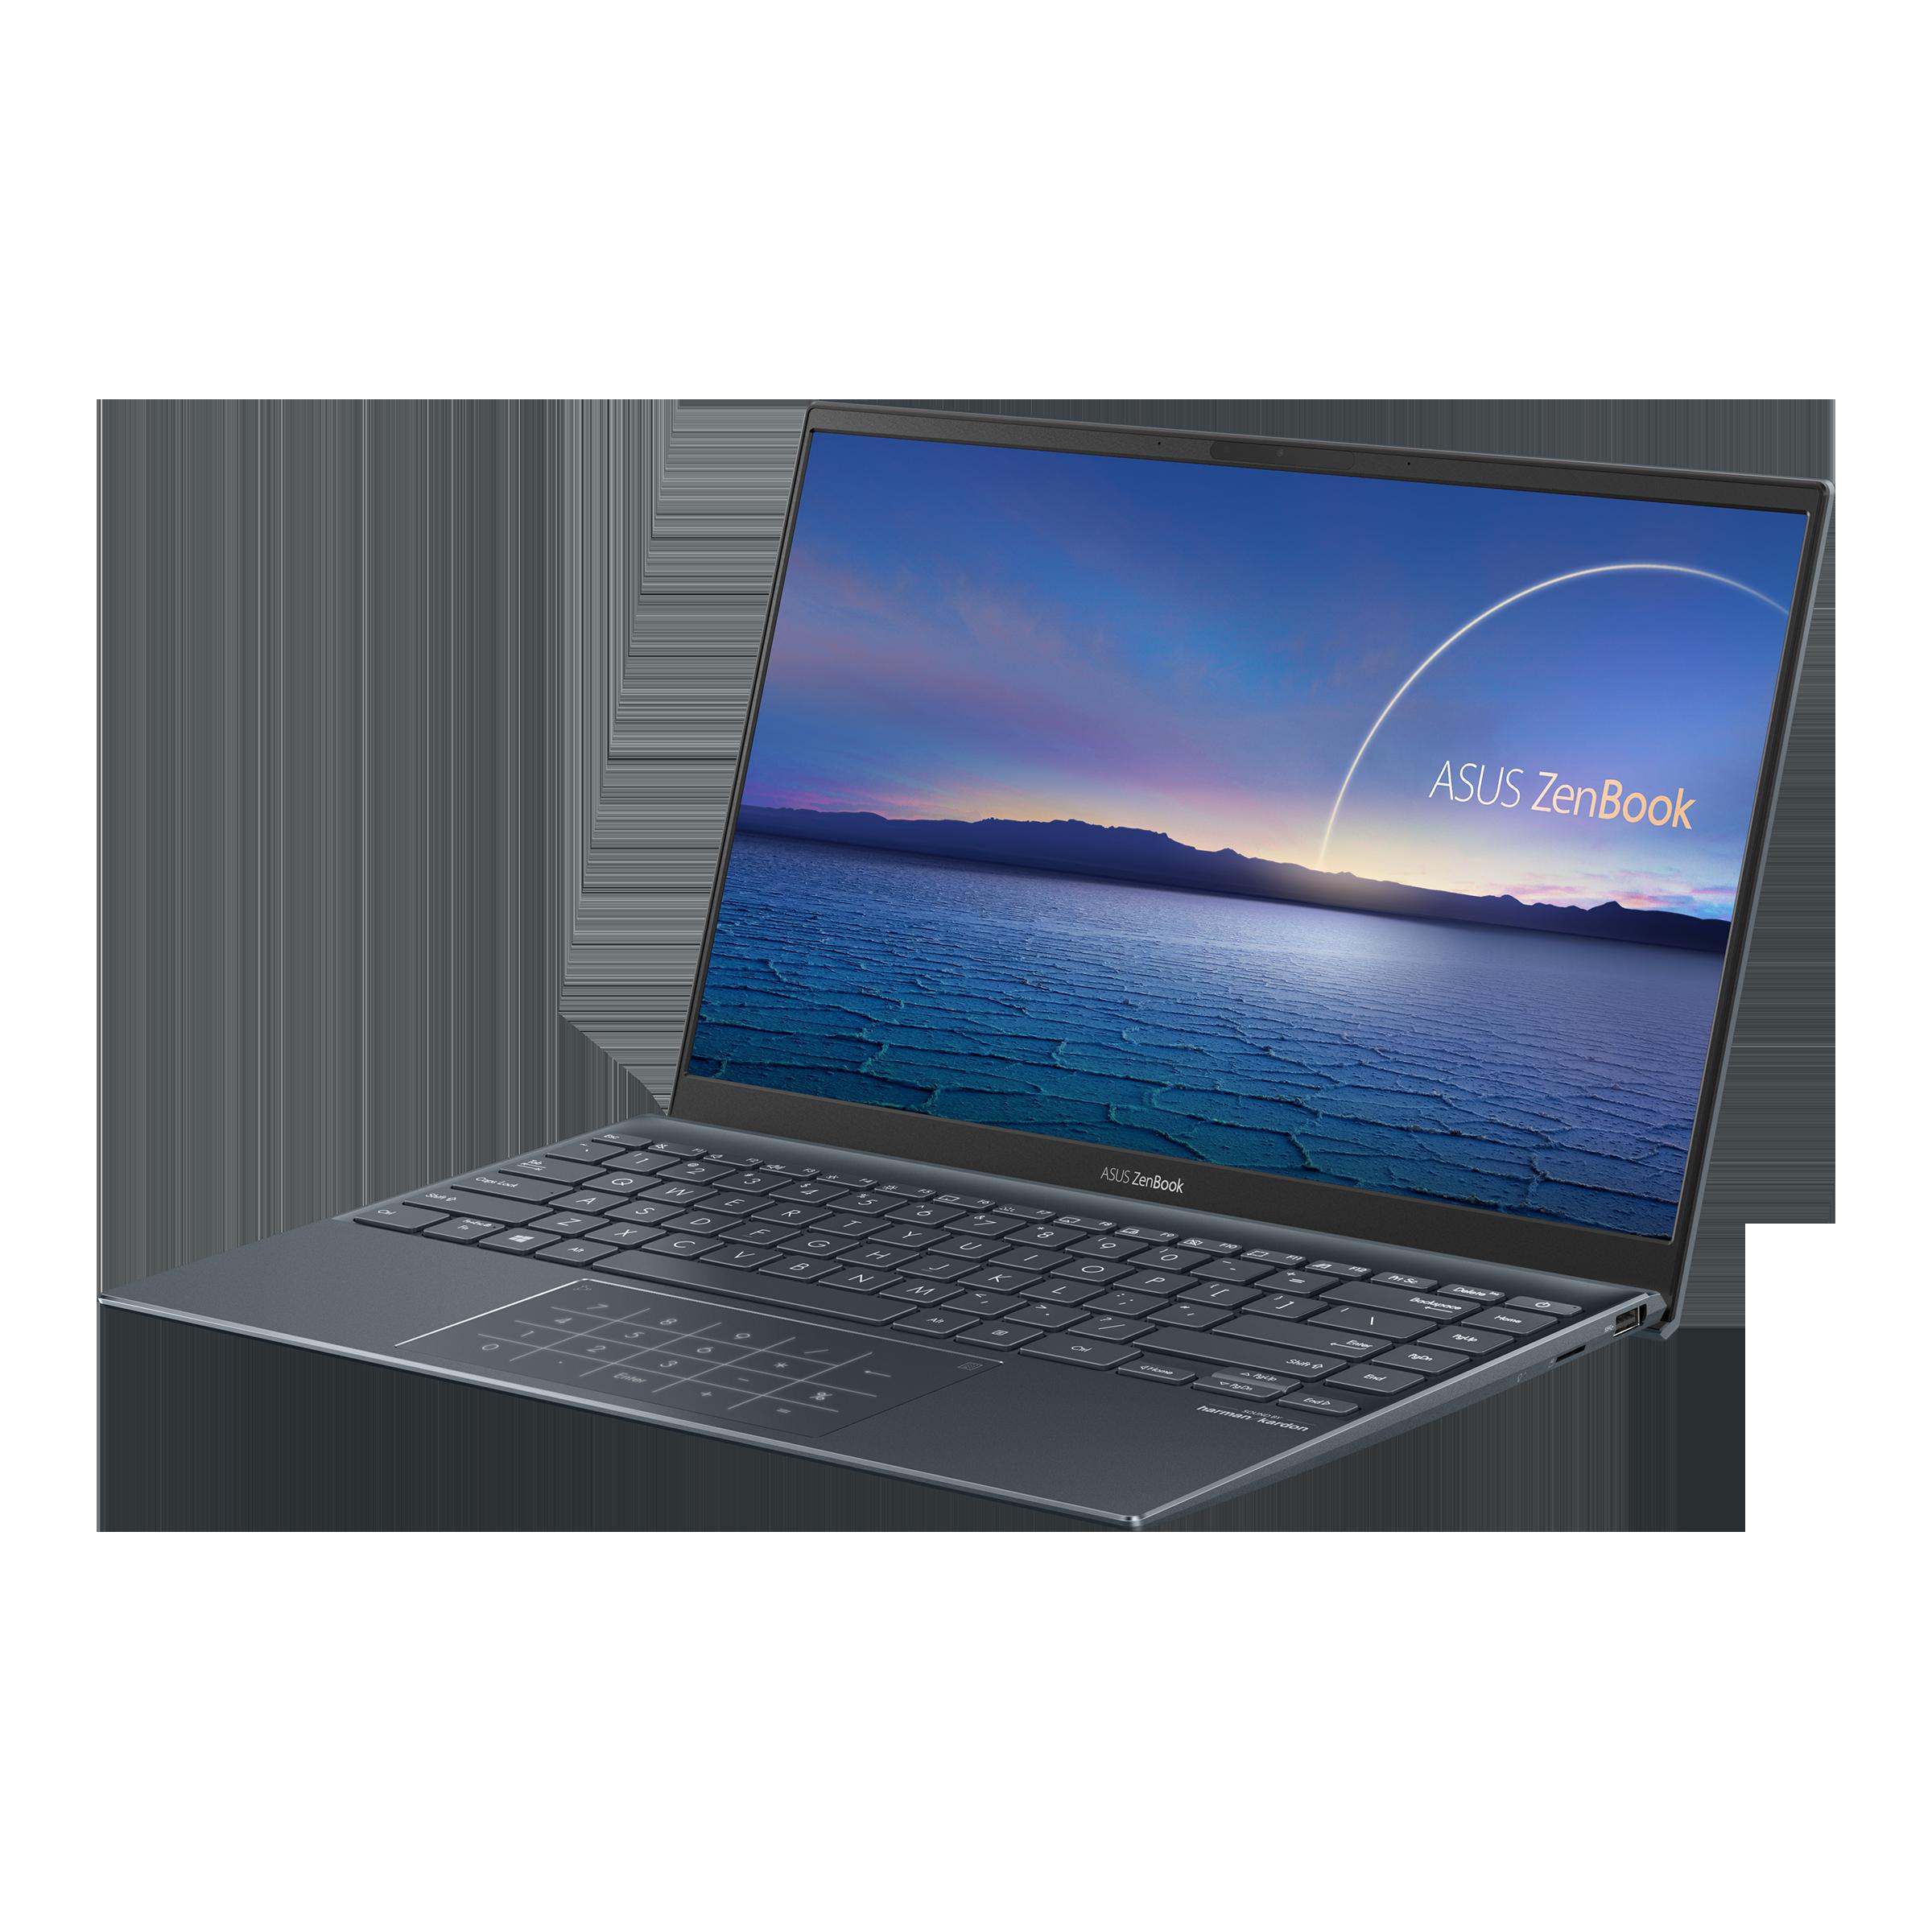 Notebook Asus Zenbook 14 UM425IA-AM003 AMD Ryzen 5 4500U 8Gb SSD 512Gb 14